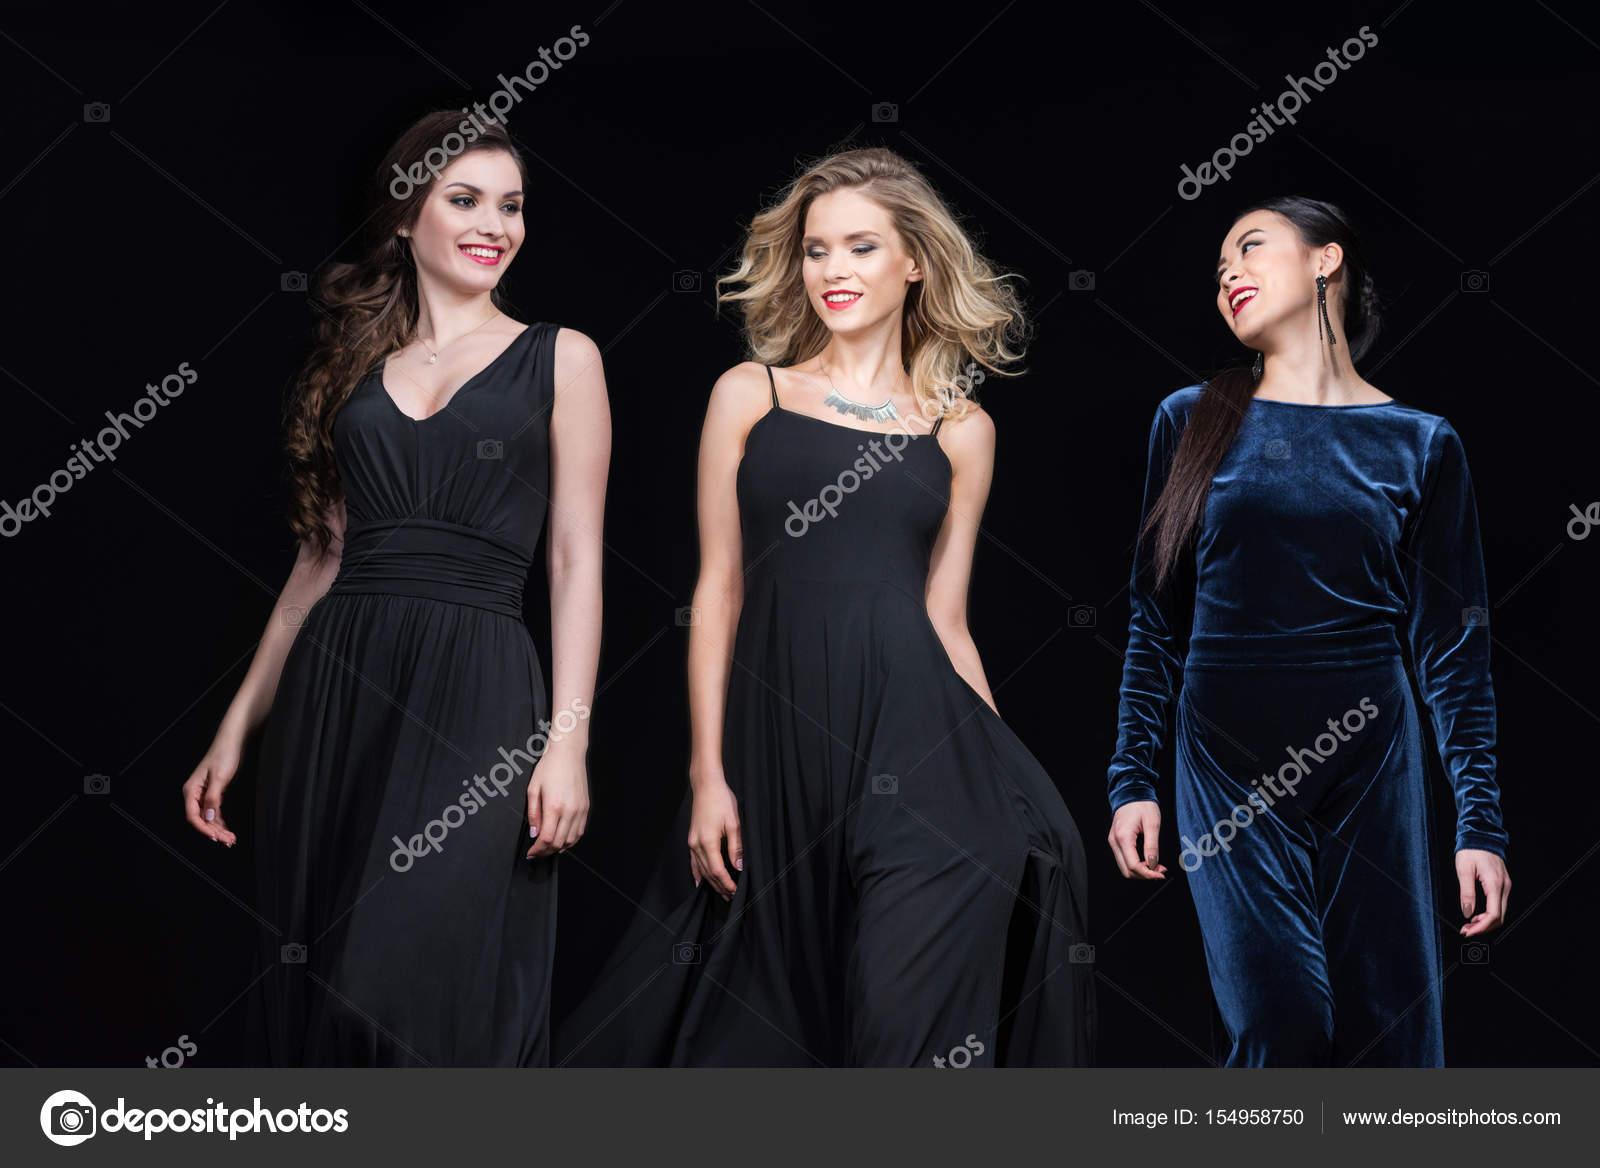 540aae583f13 Γυναικών κομψό Μάξι φορέματα — Φωτογραφία Αρχείου © TarasMalyarevich ...